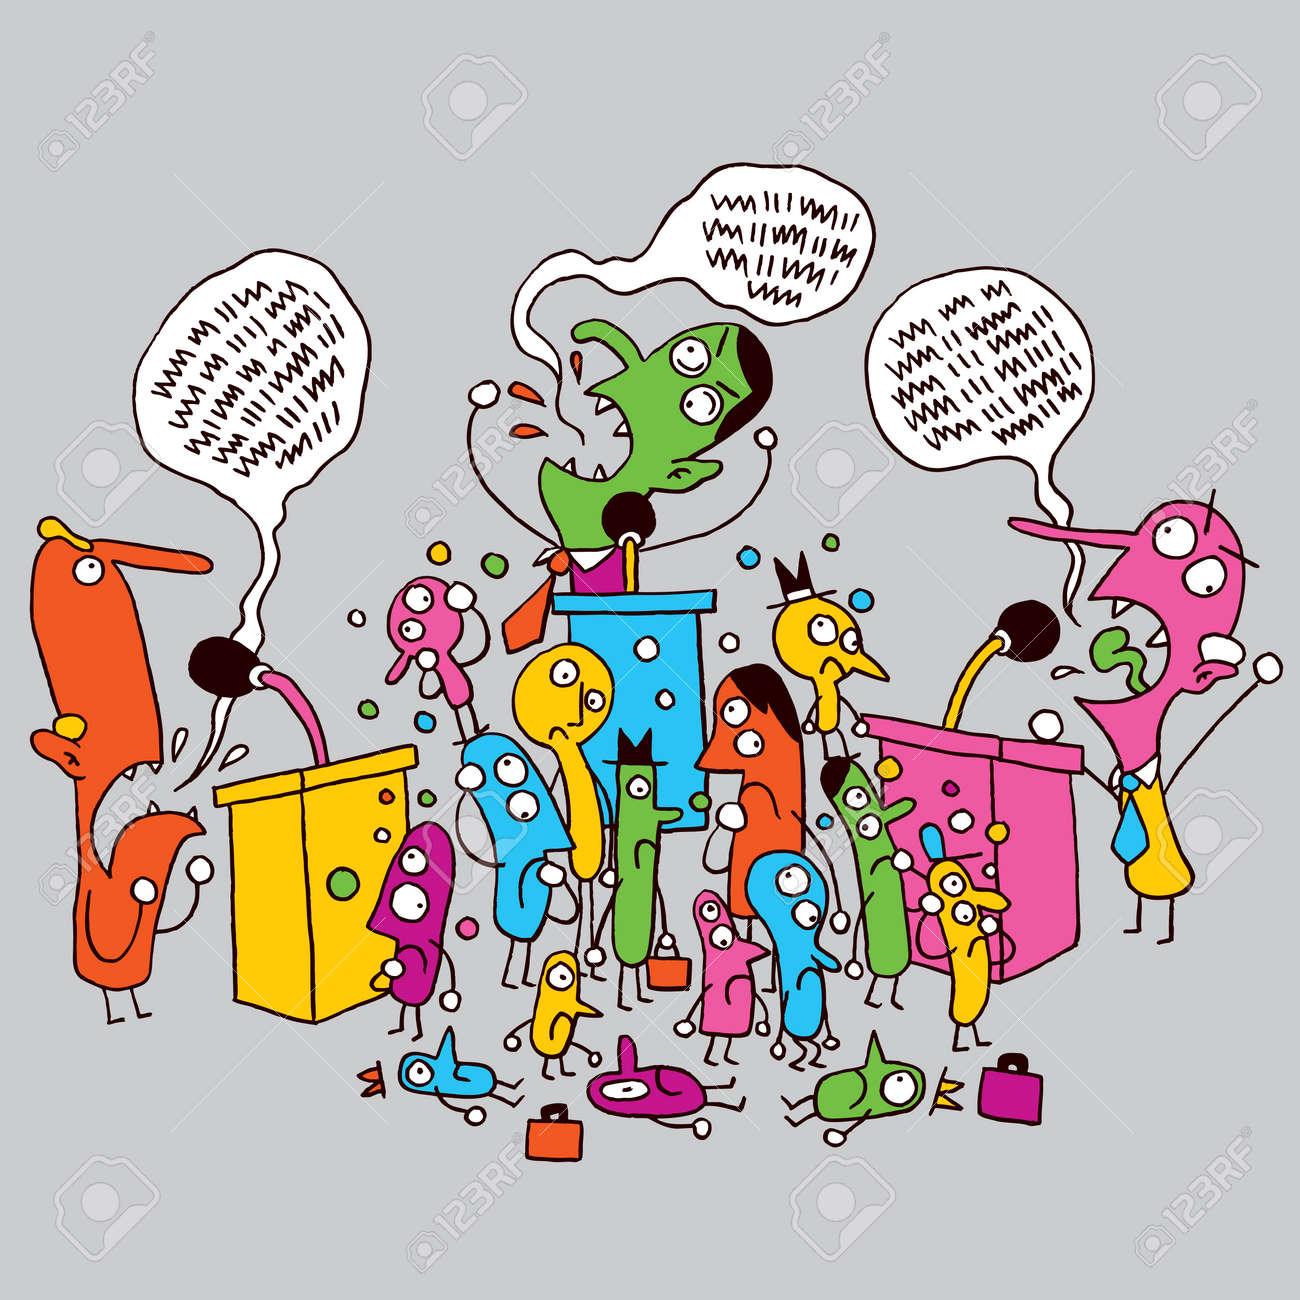 politics cartoon - 26366881